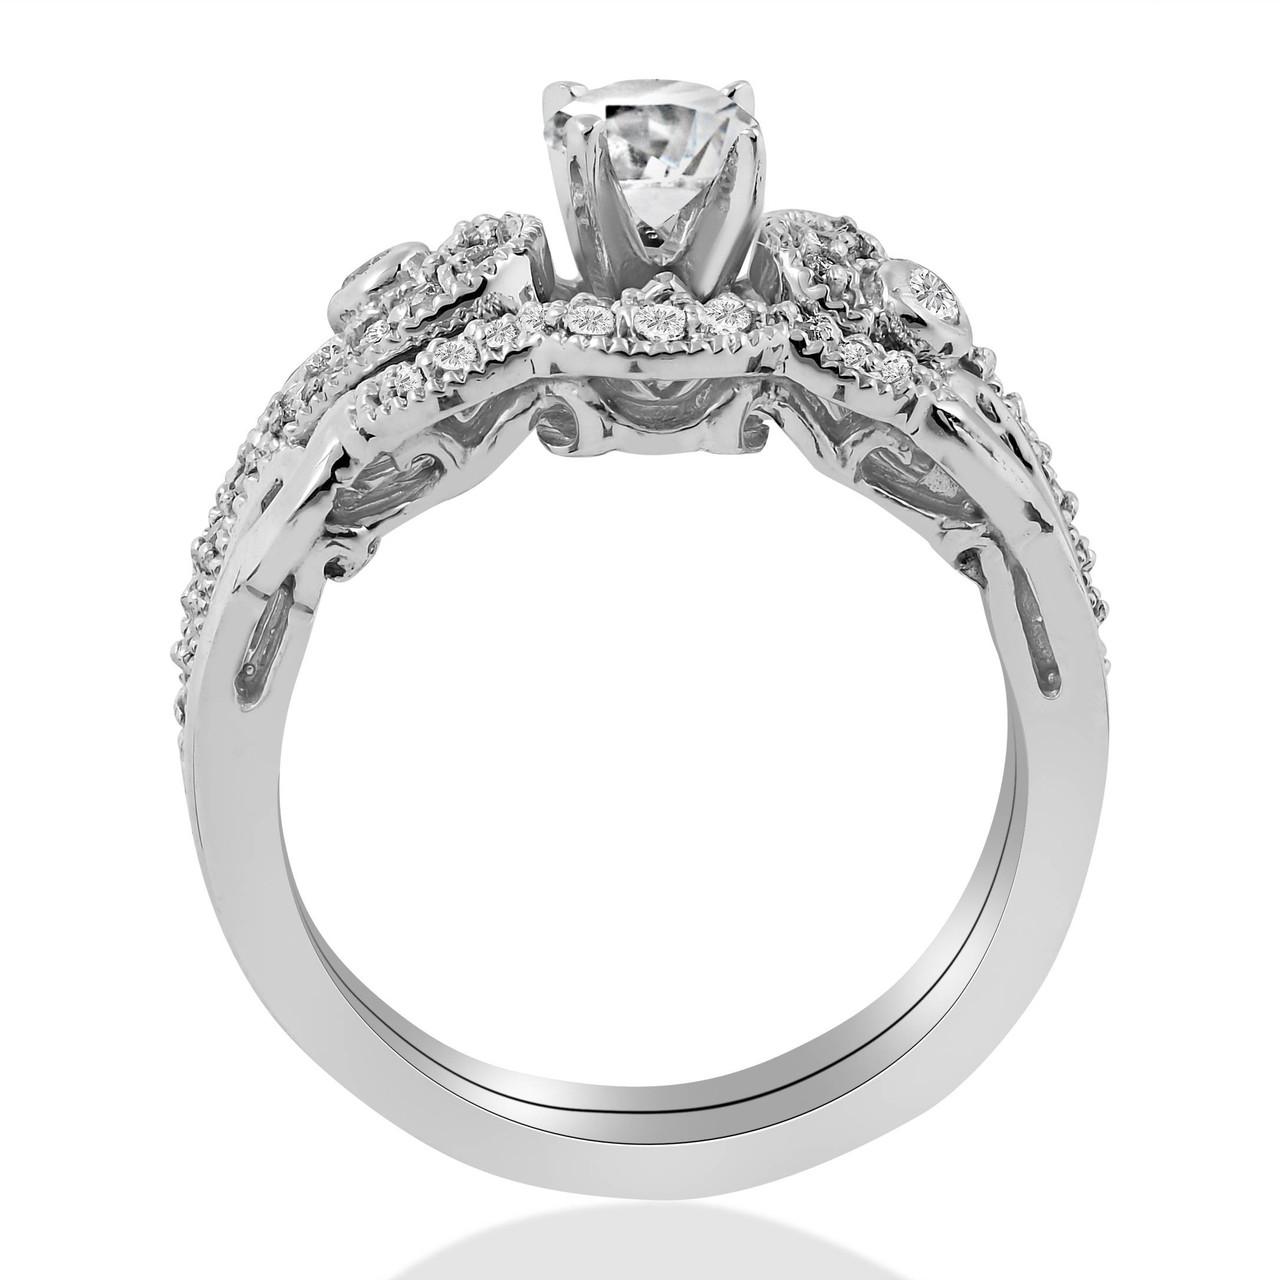 a5d9c612864 Emery 3 4Ct Vintage Diamond Engagement Wedding Ring Set 14K White Gold